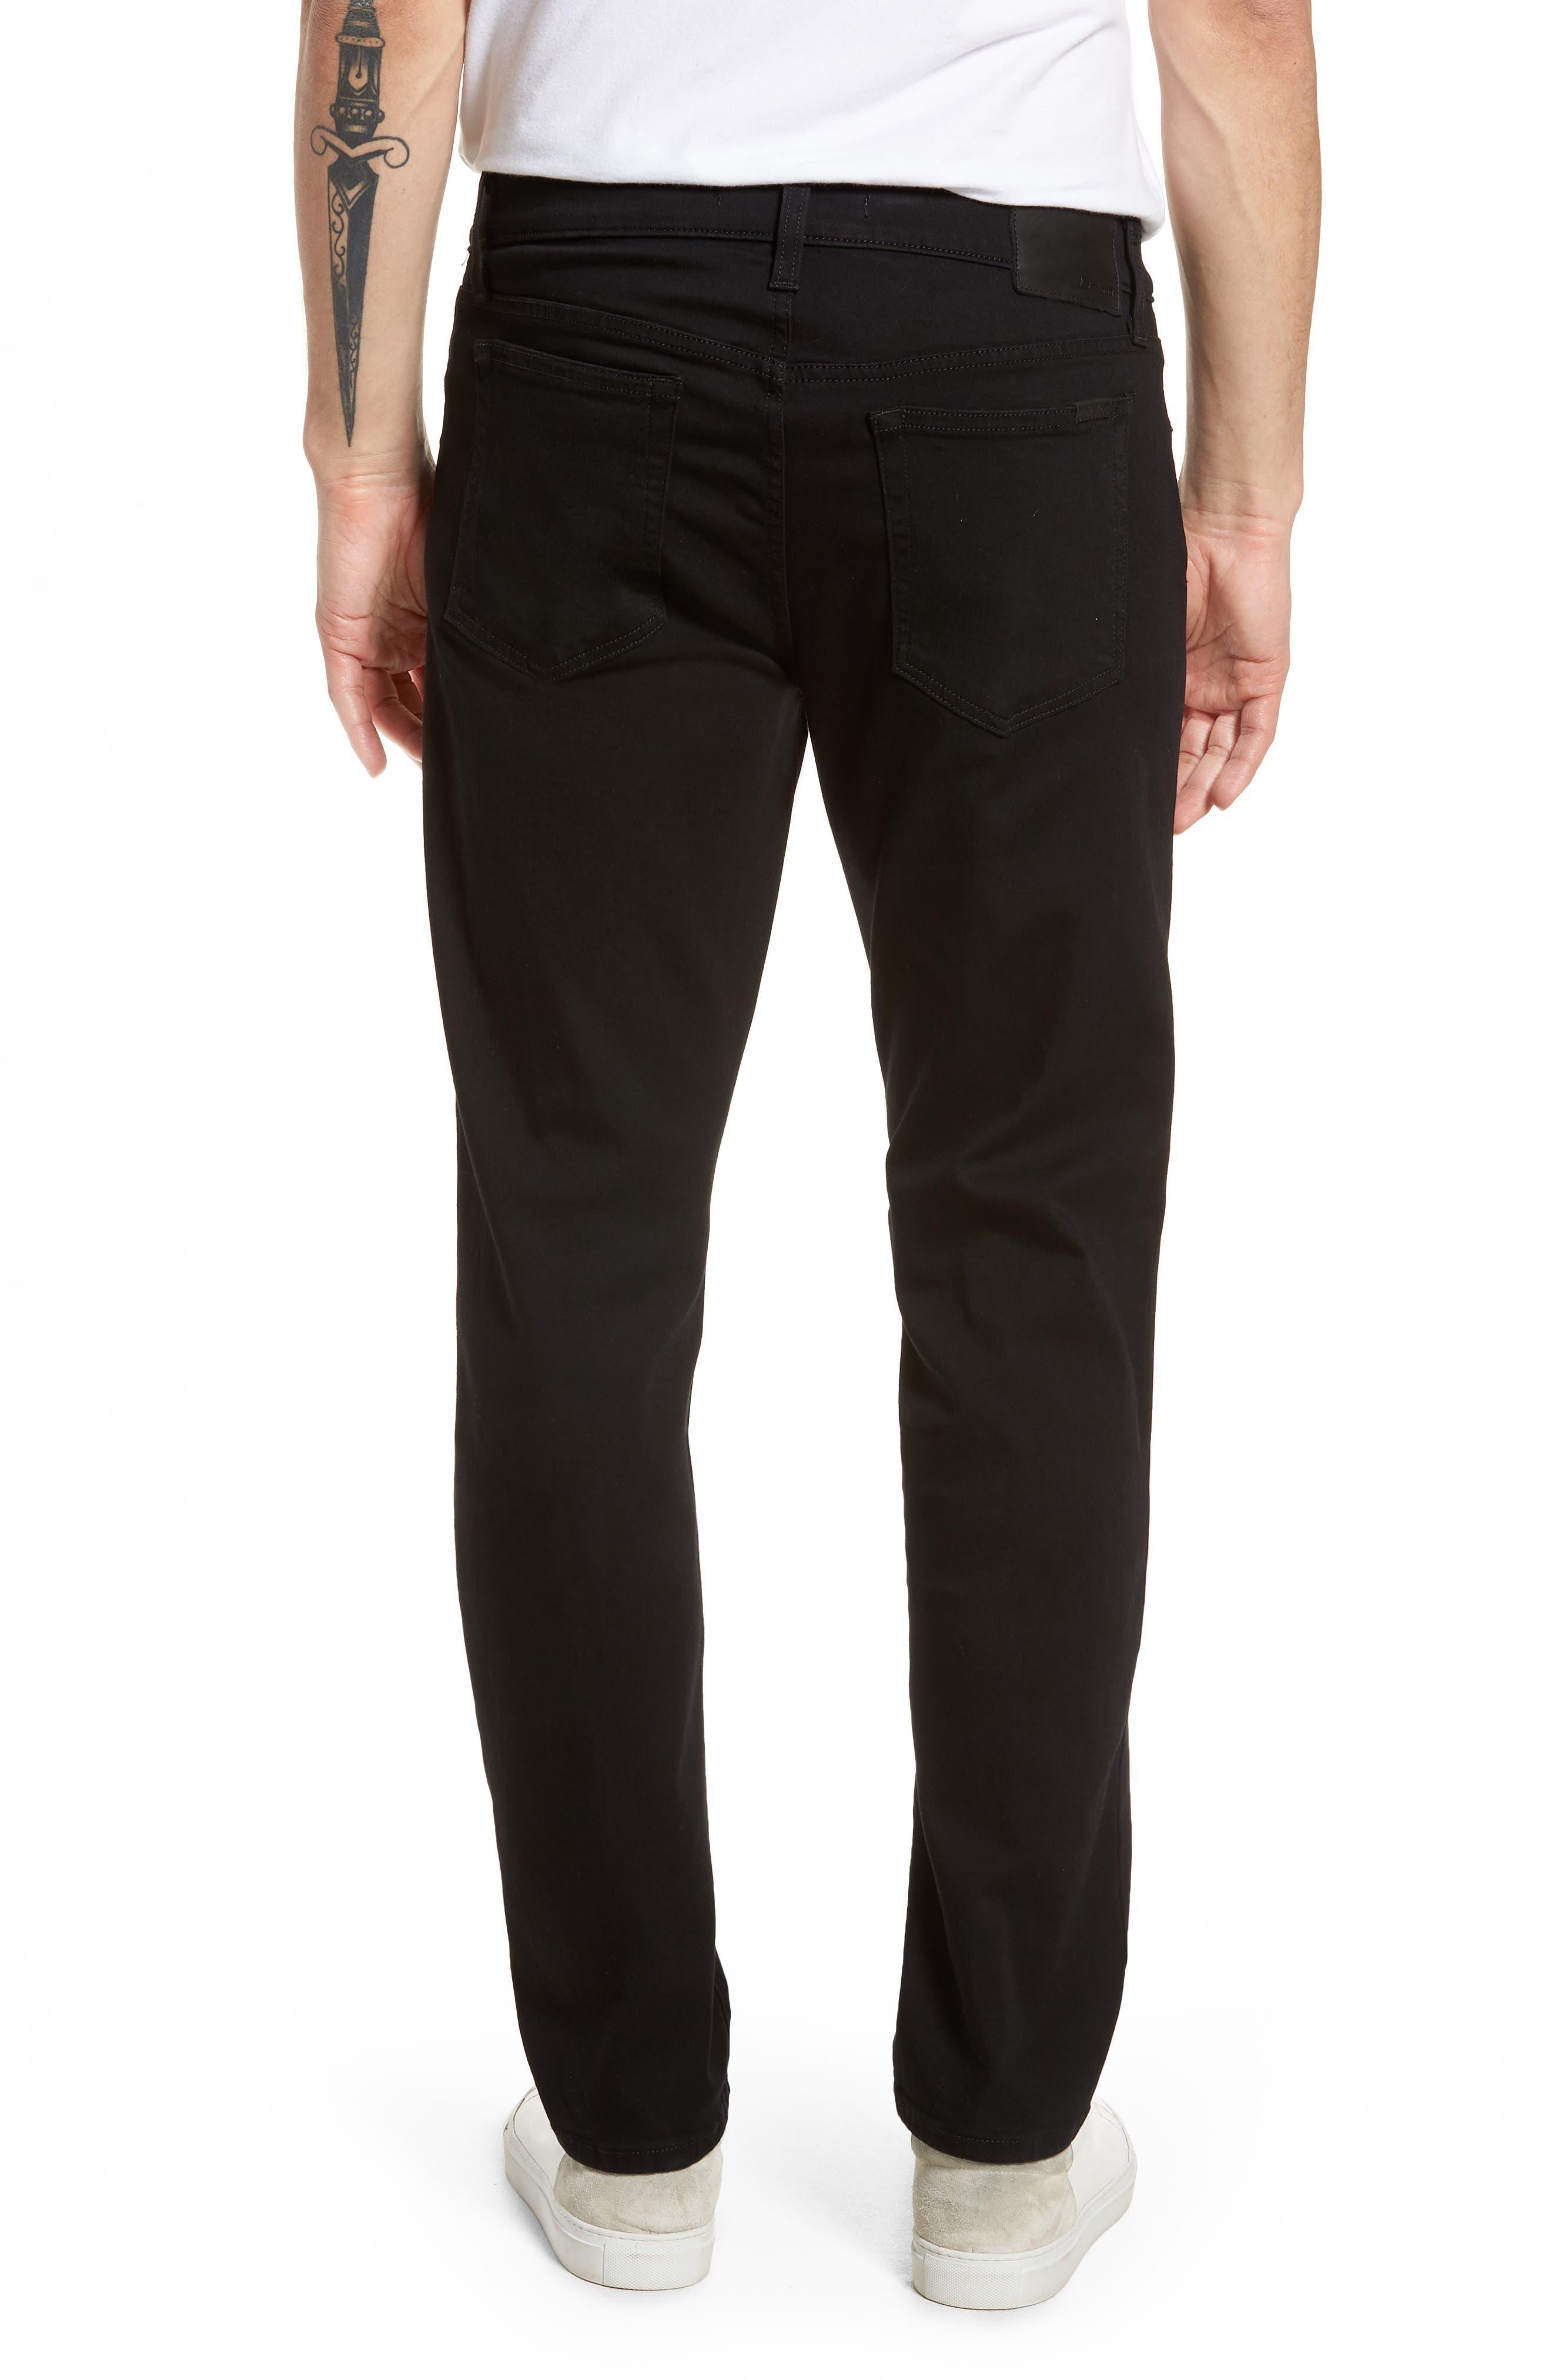 Brixton Slim Straight Fit Jeans,                             Alternate thumbnail 2, color,                             ABRAHAM